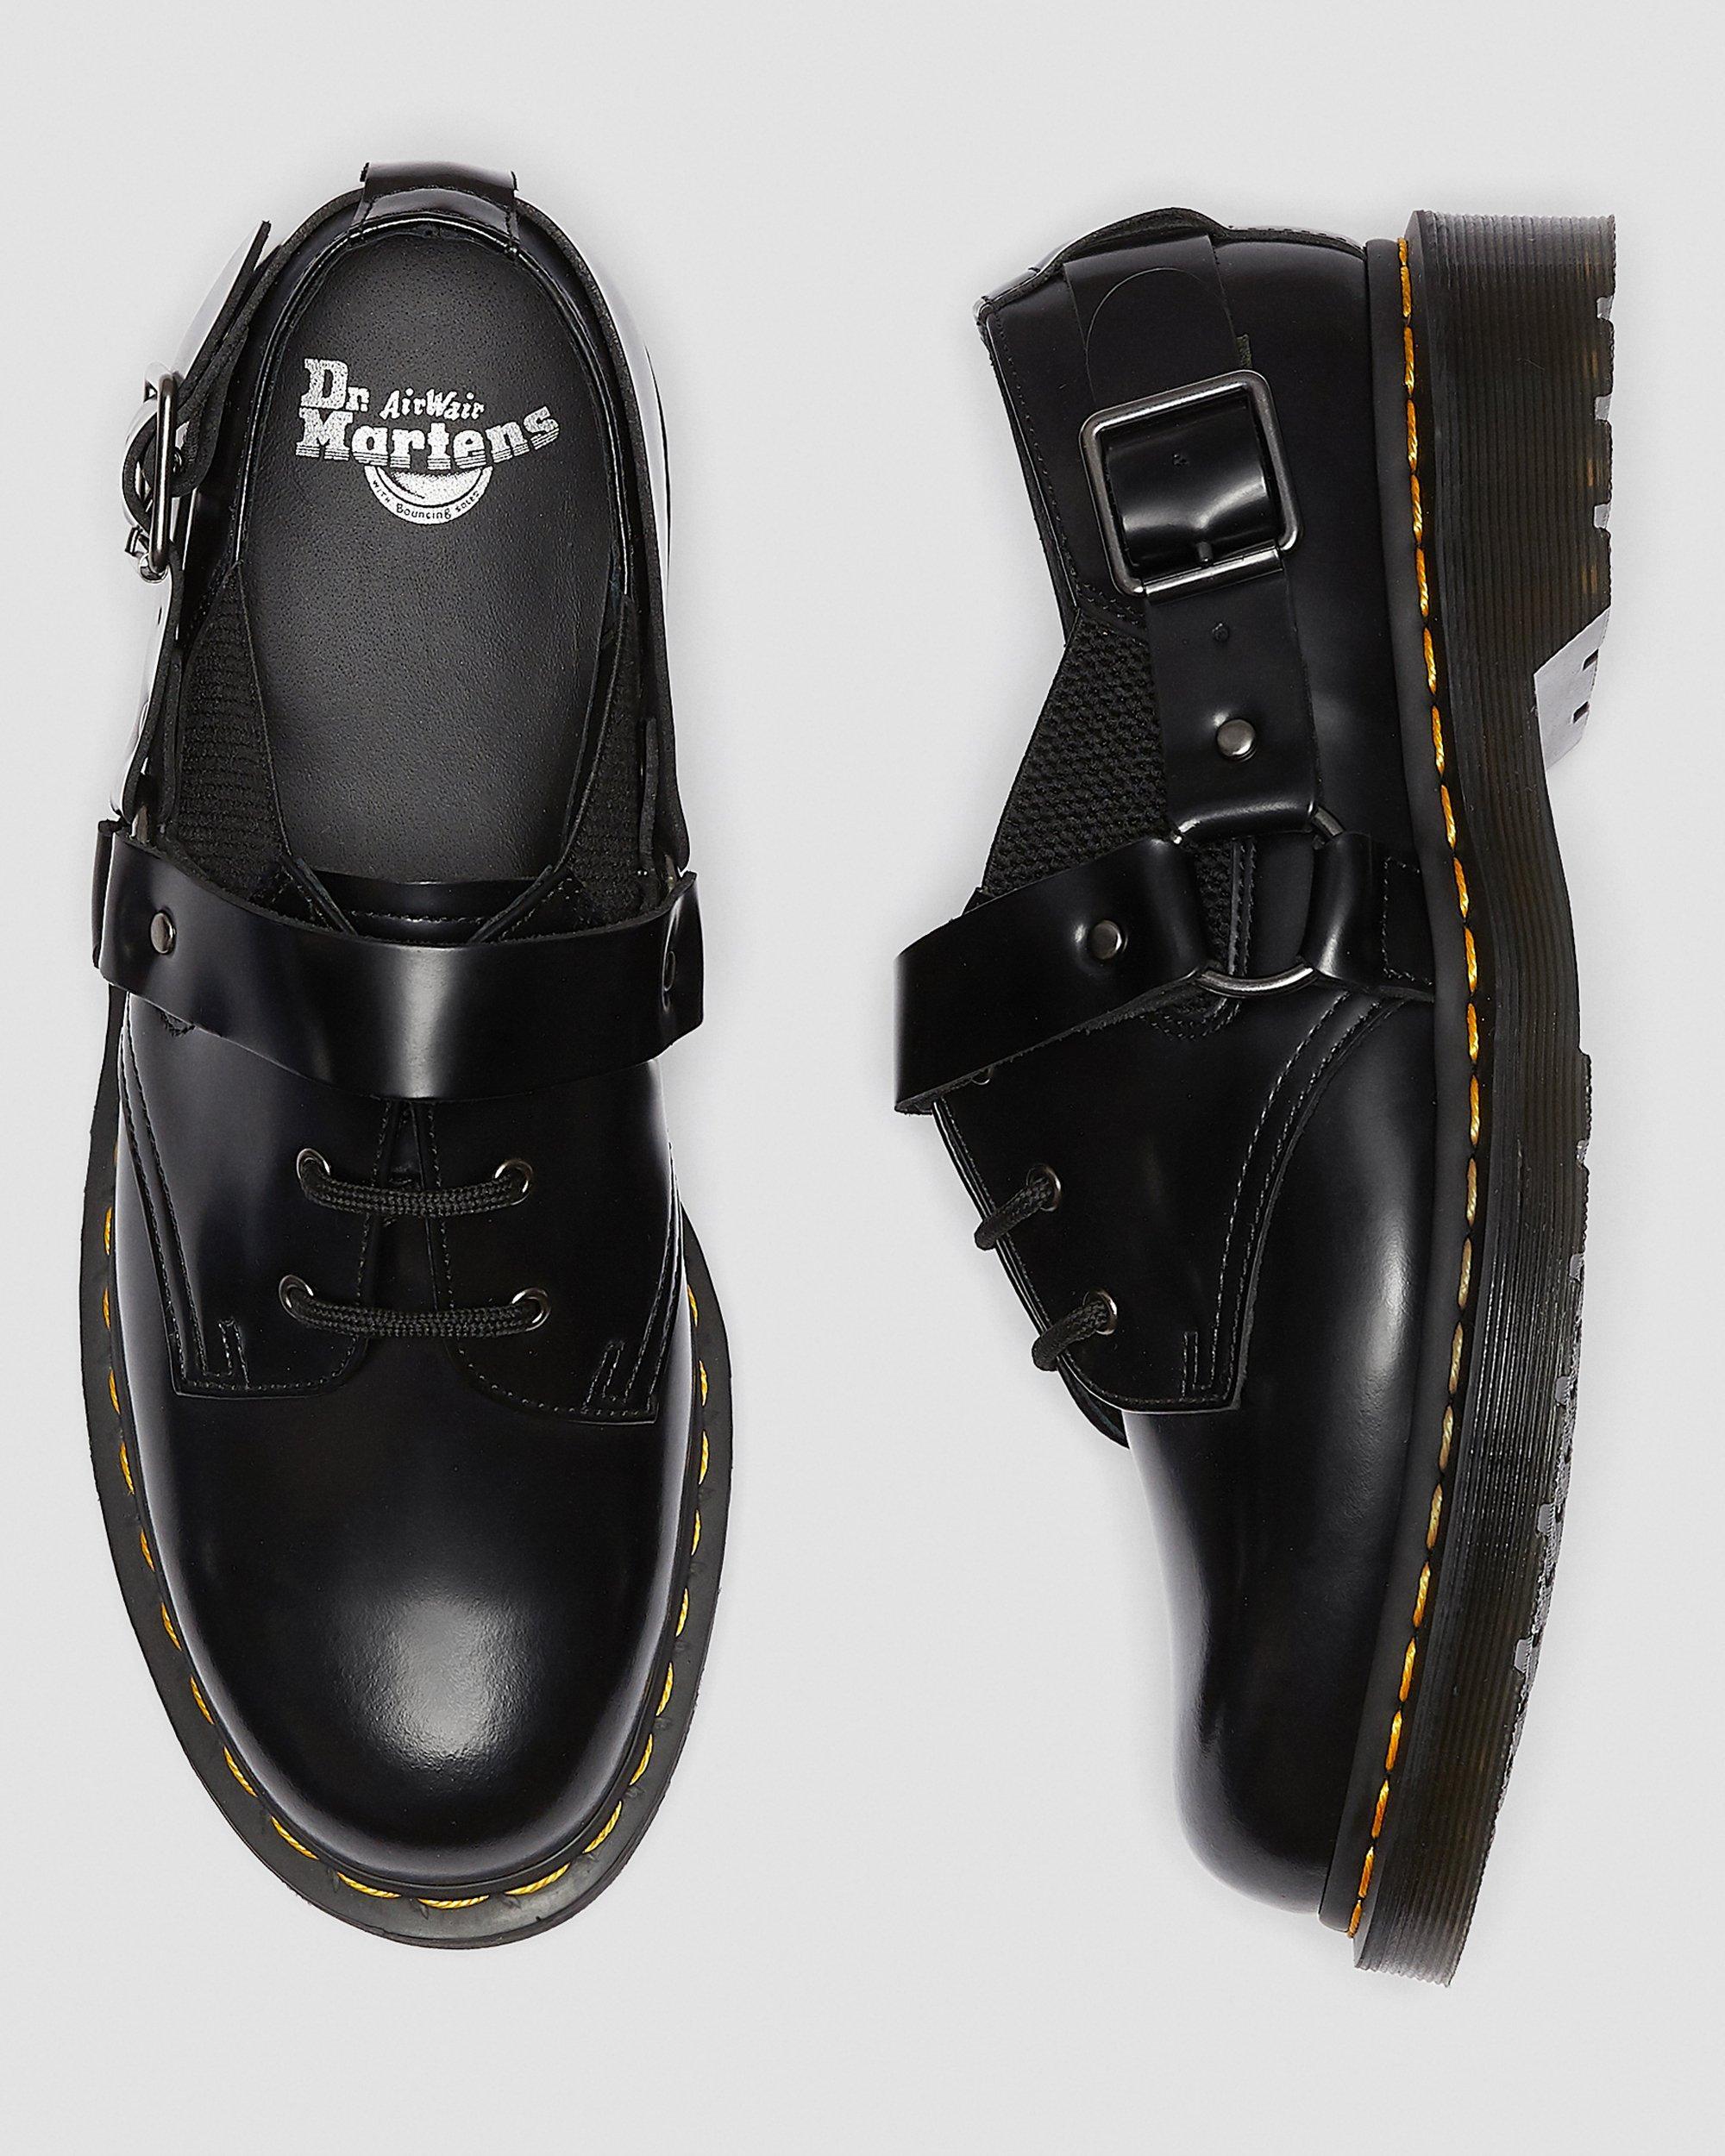 dr martens fulmar shoes in black